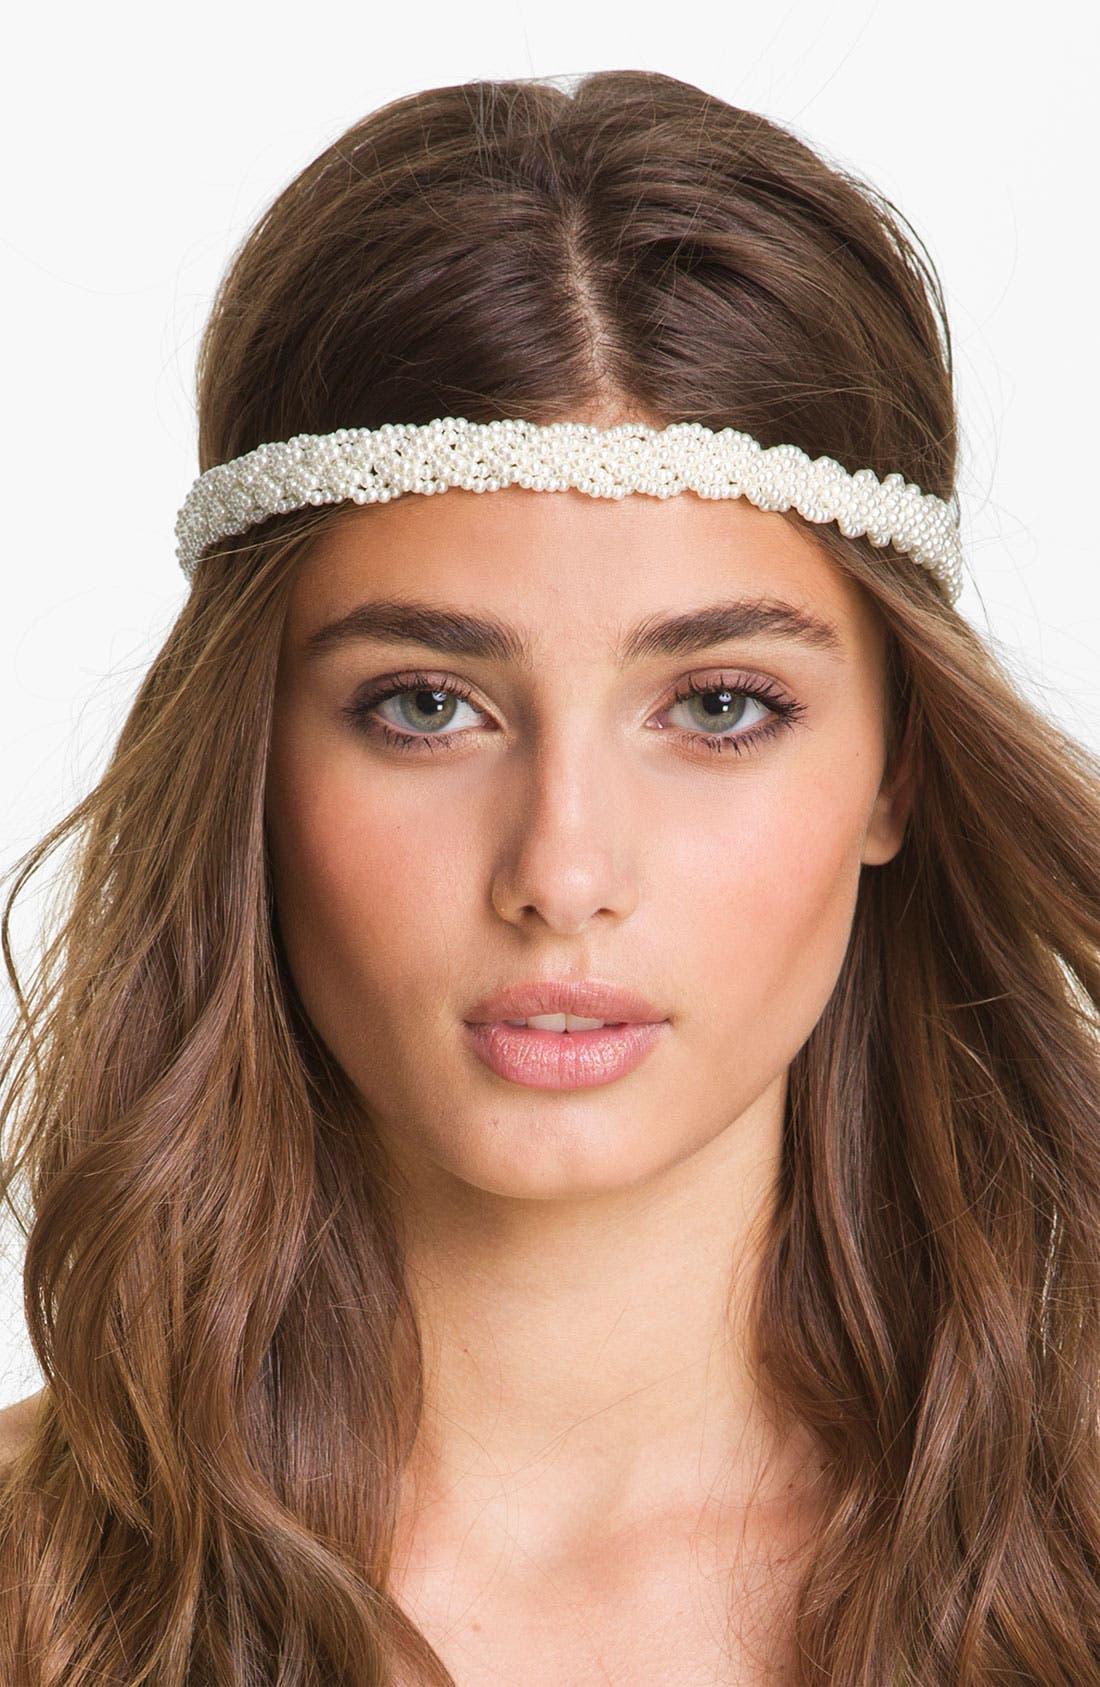 Alternate Image 1 Selected - Carole Braided Pearlized Bead Headband